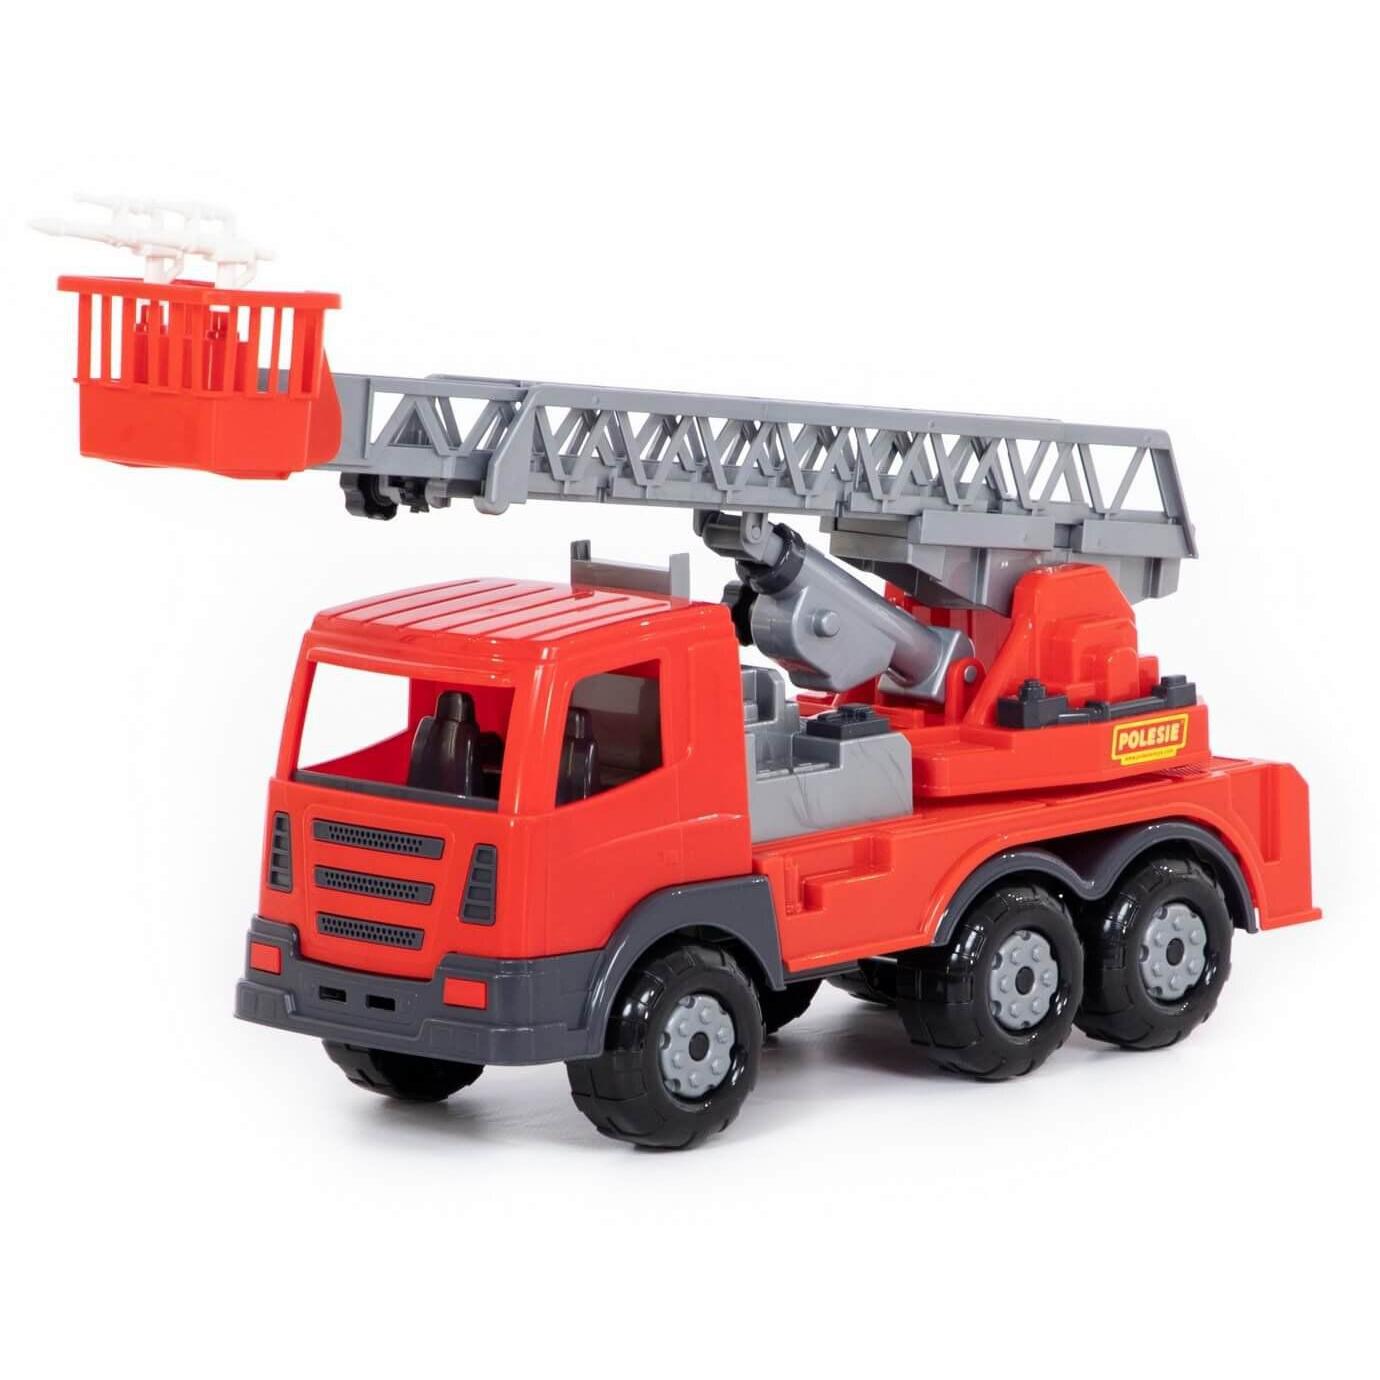 Straż pożarna zabawka